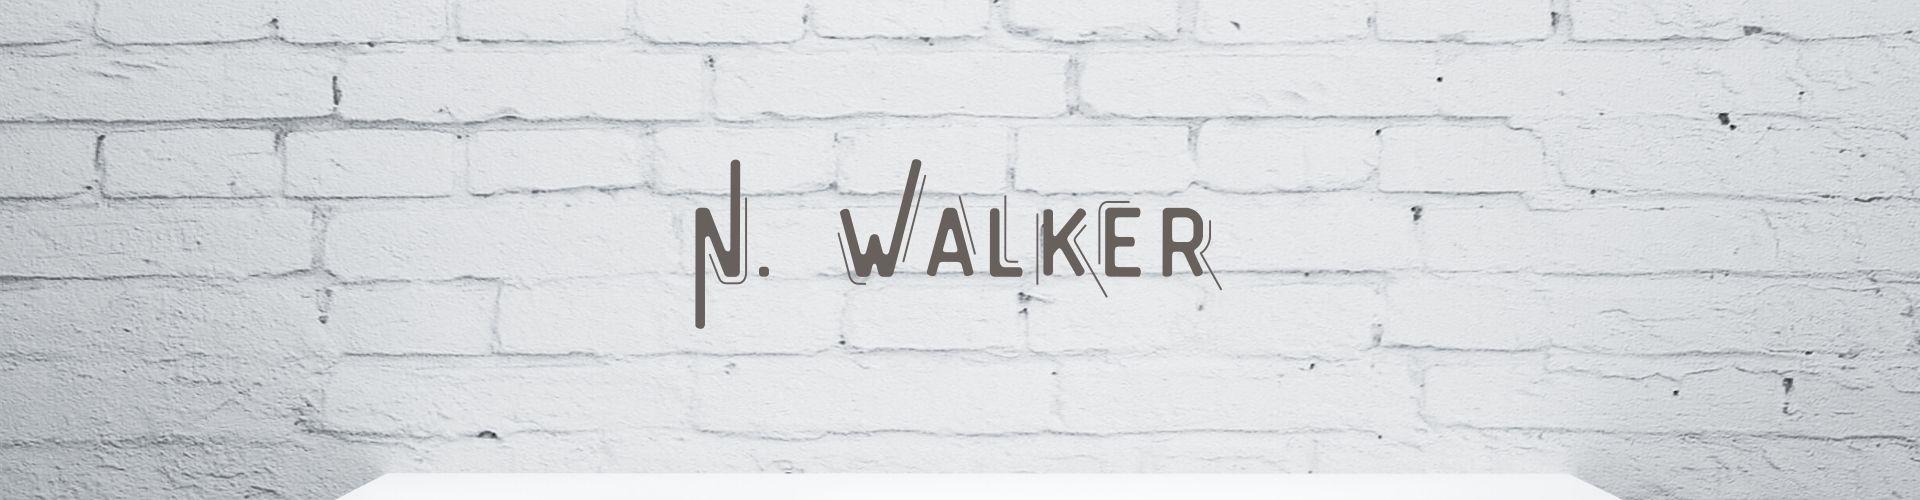 Nick Walker : Artiste de Street Art